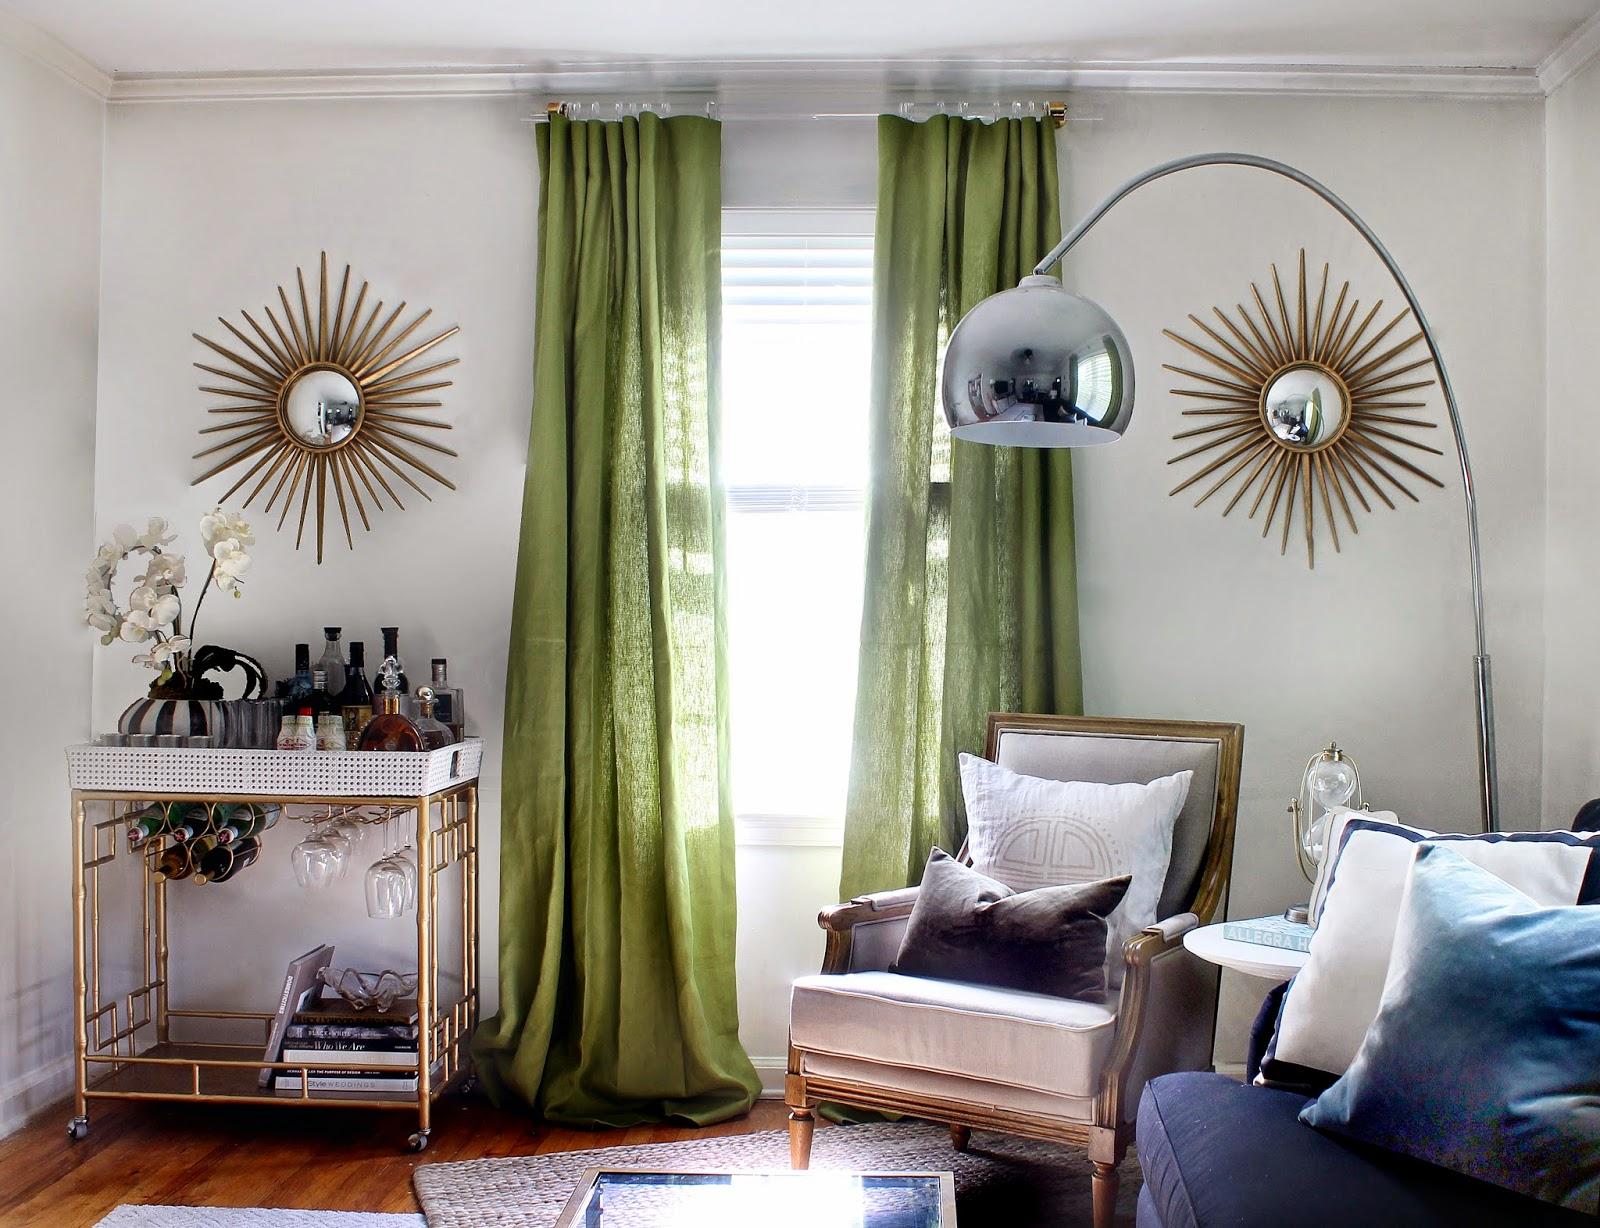 Acrylic curtain rod - Nationwide Plastics